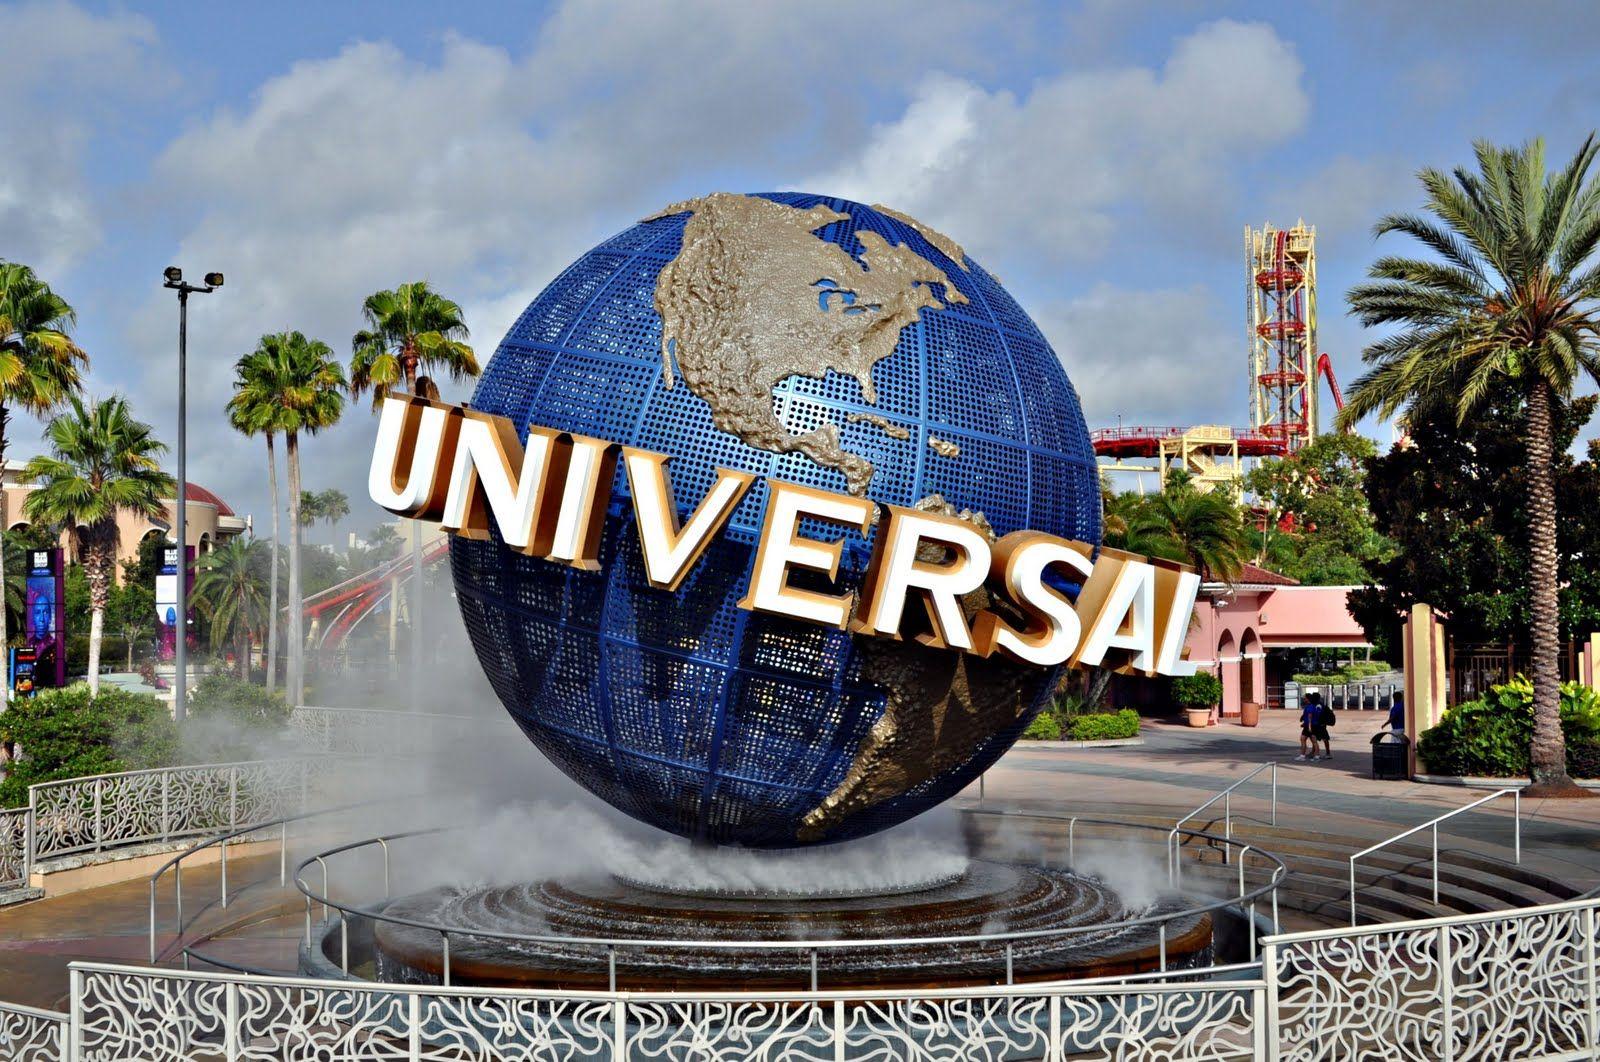 Universal-Studios-reabre sus puertas-posdata digital-press